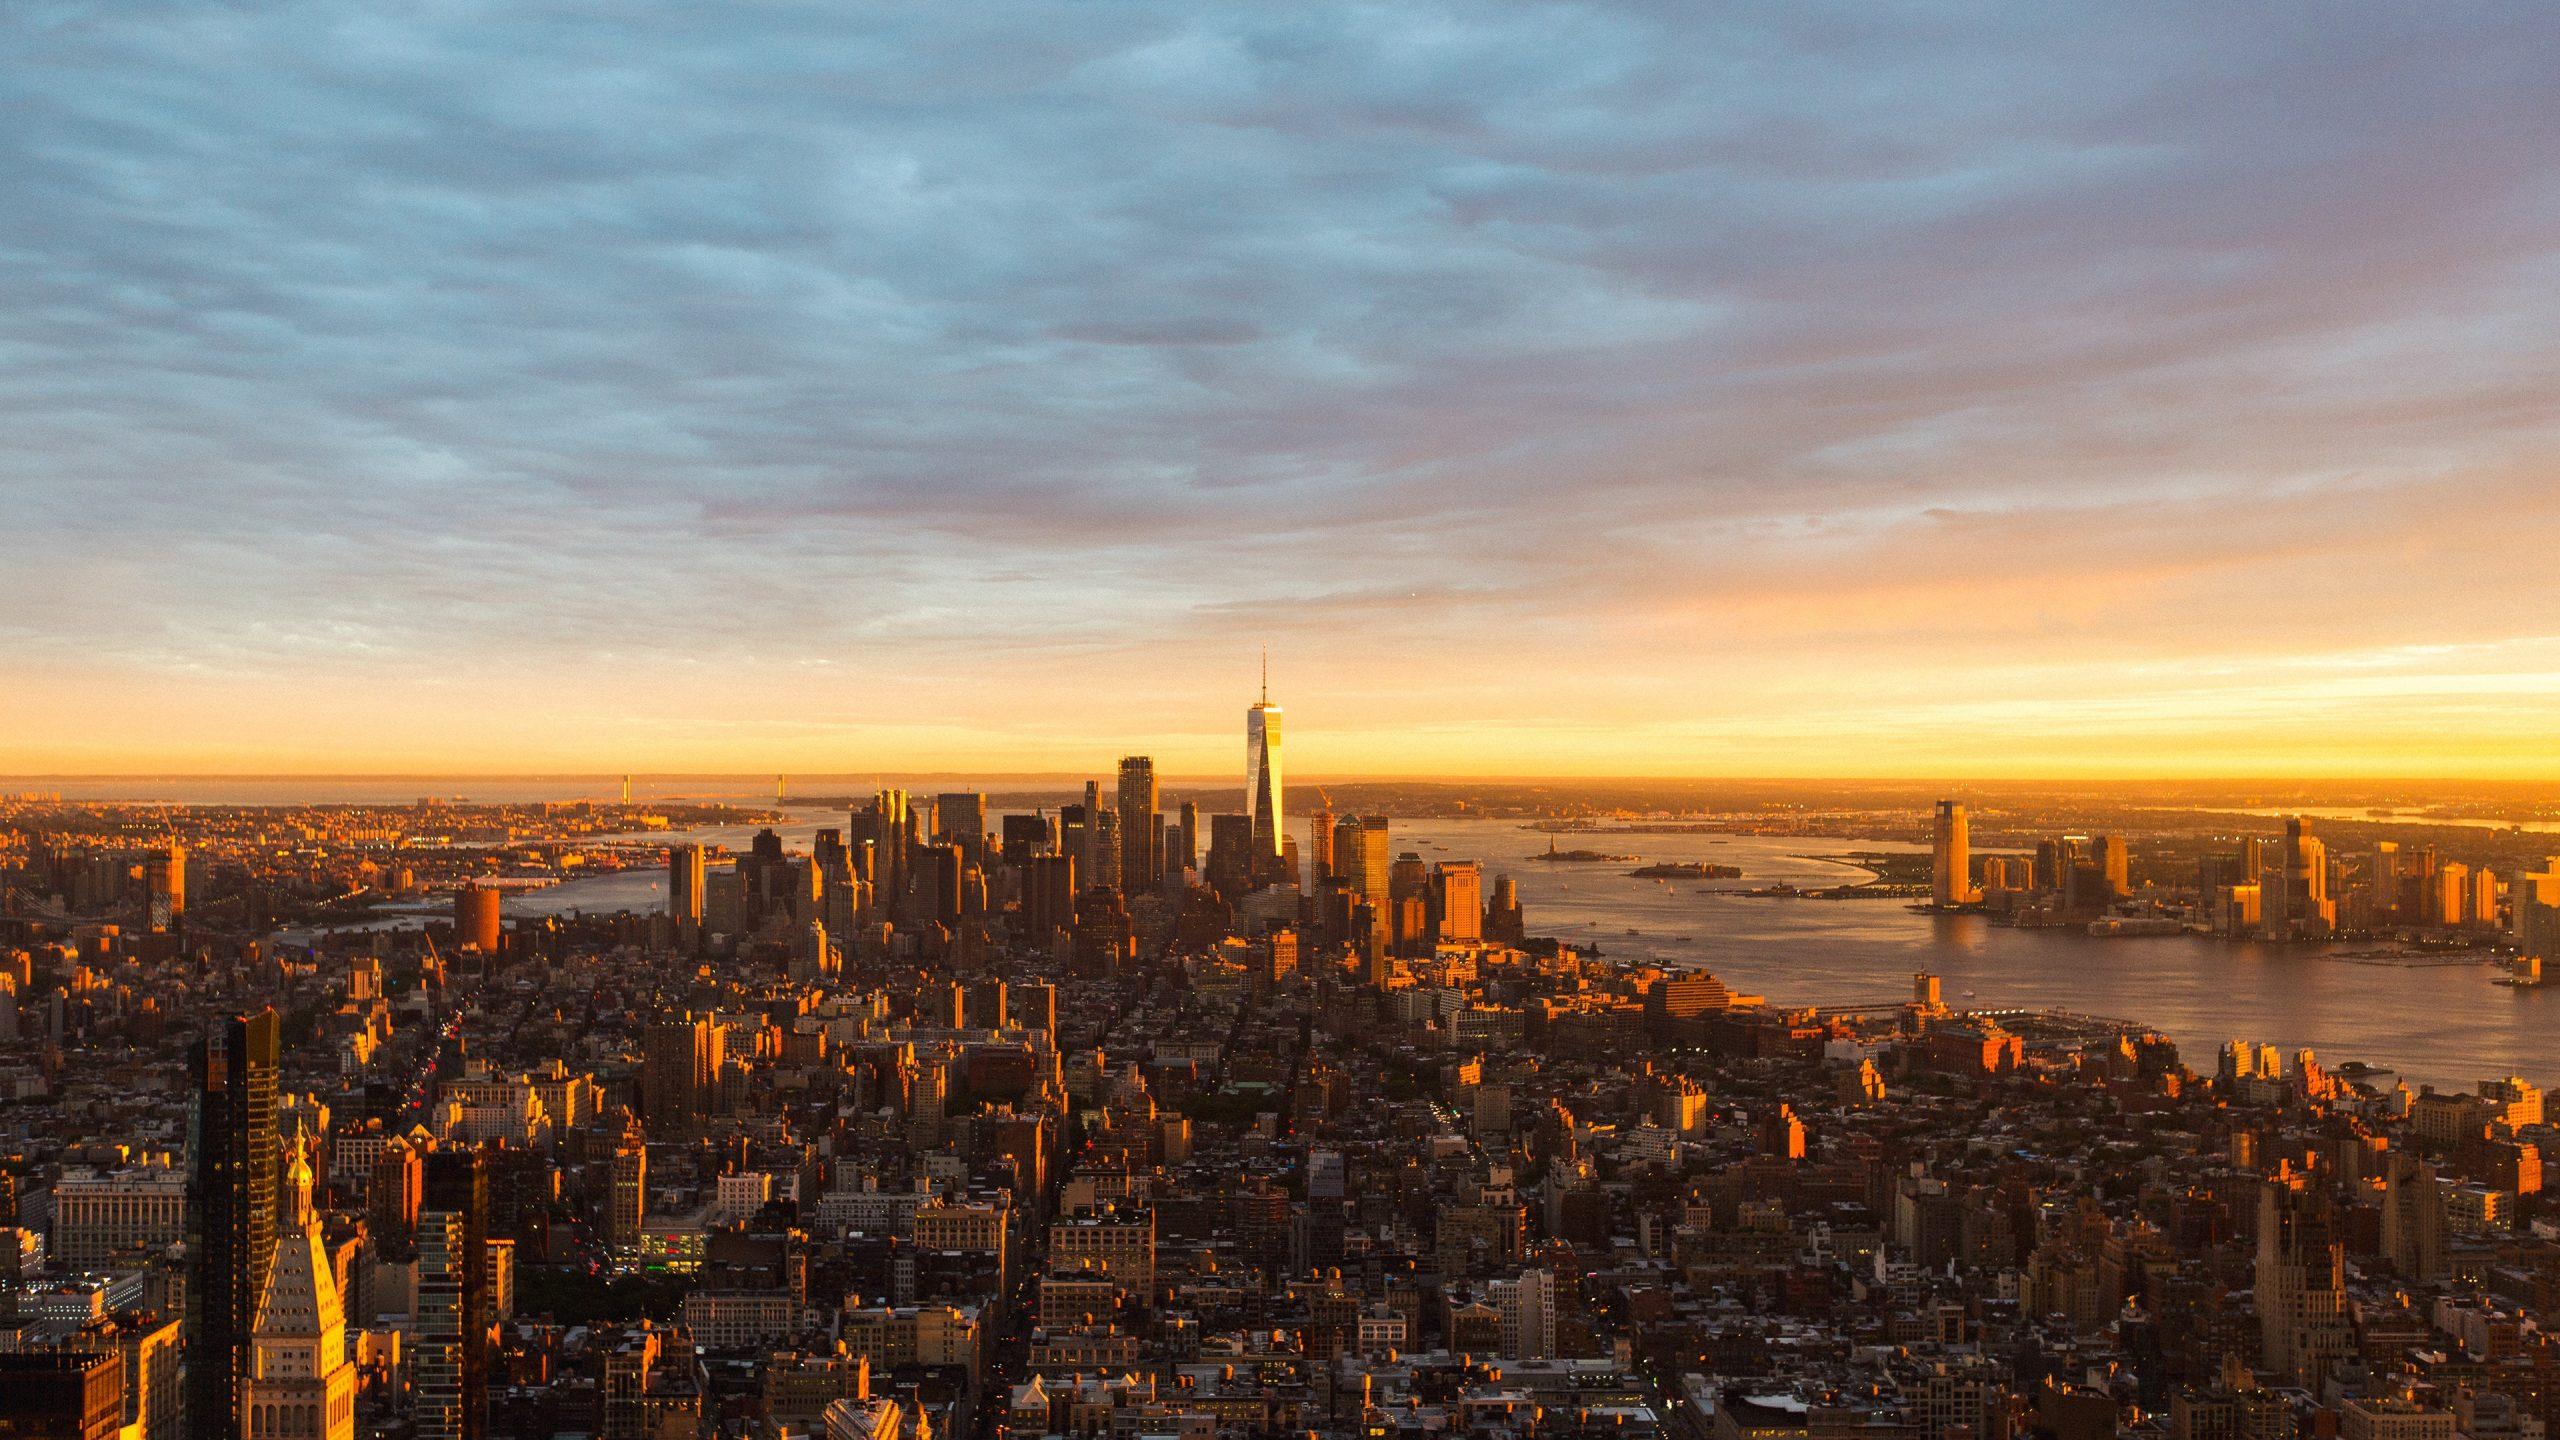 New York Iconic sunrise sunrise johannes-hurtig-z-fpG7D7buk-unsplash